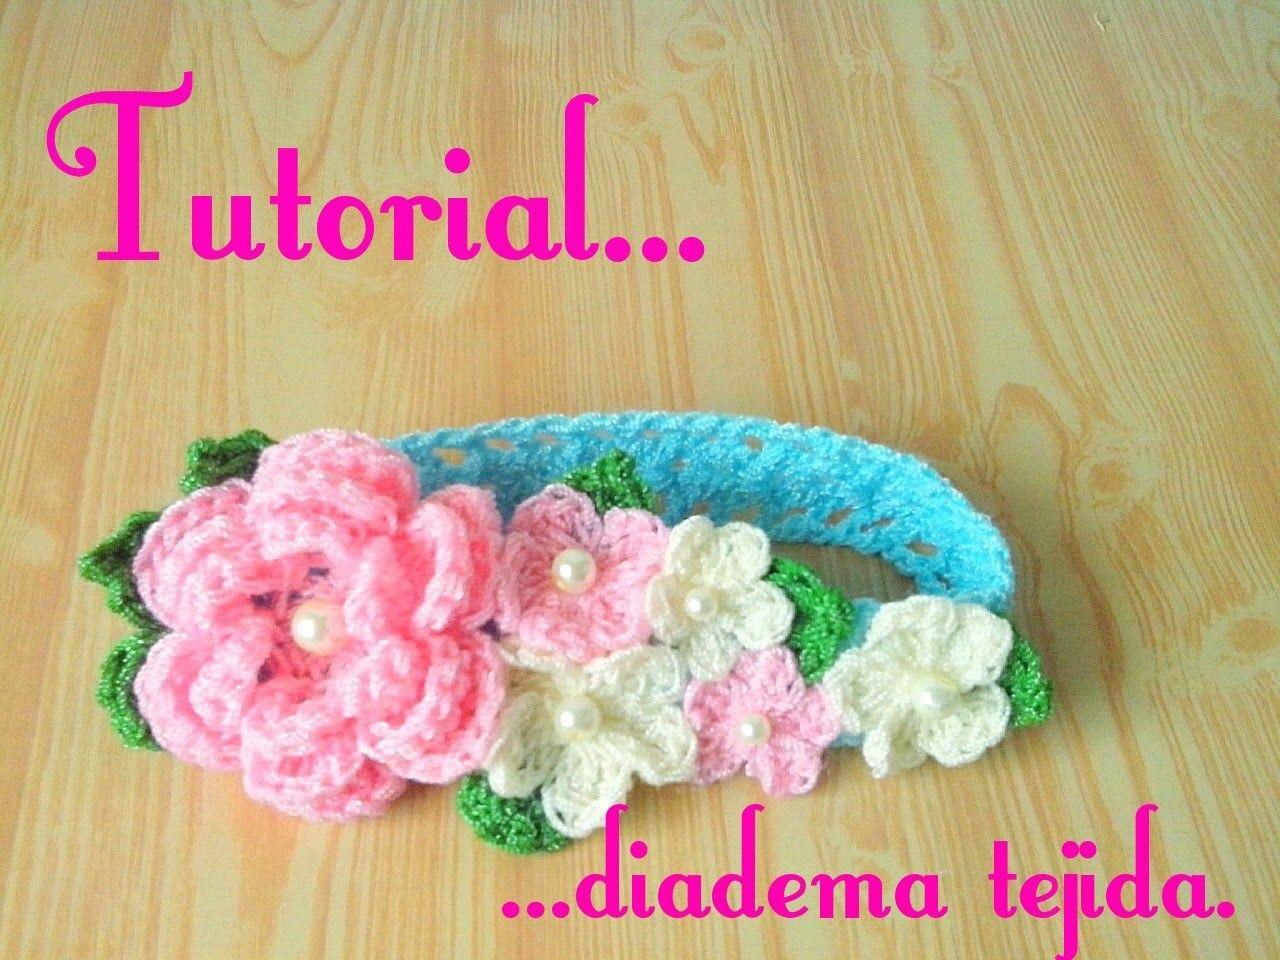 Crochet diadema tejida para bebe crochet crocheted - Diademas a crochet ...